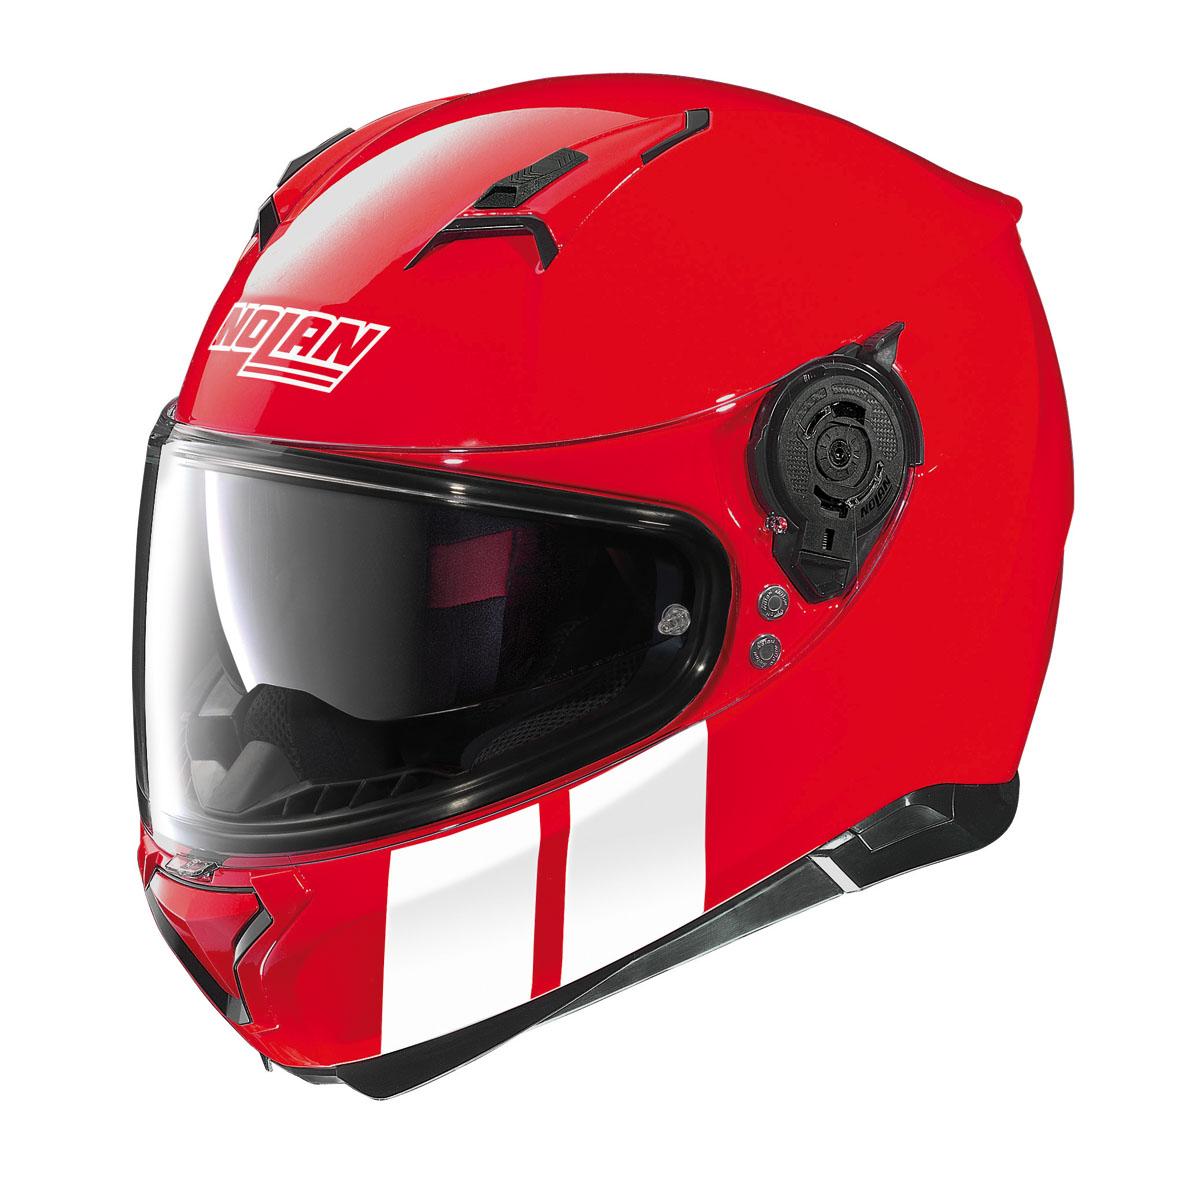 nolan helmet n87 martz n com 25 corsa red genialmotor. Black Bedroom Furniture Sets. Home Design Ideas